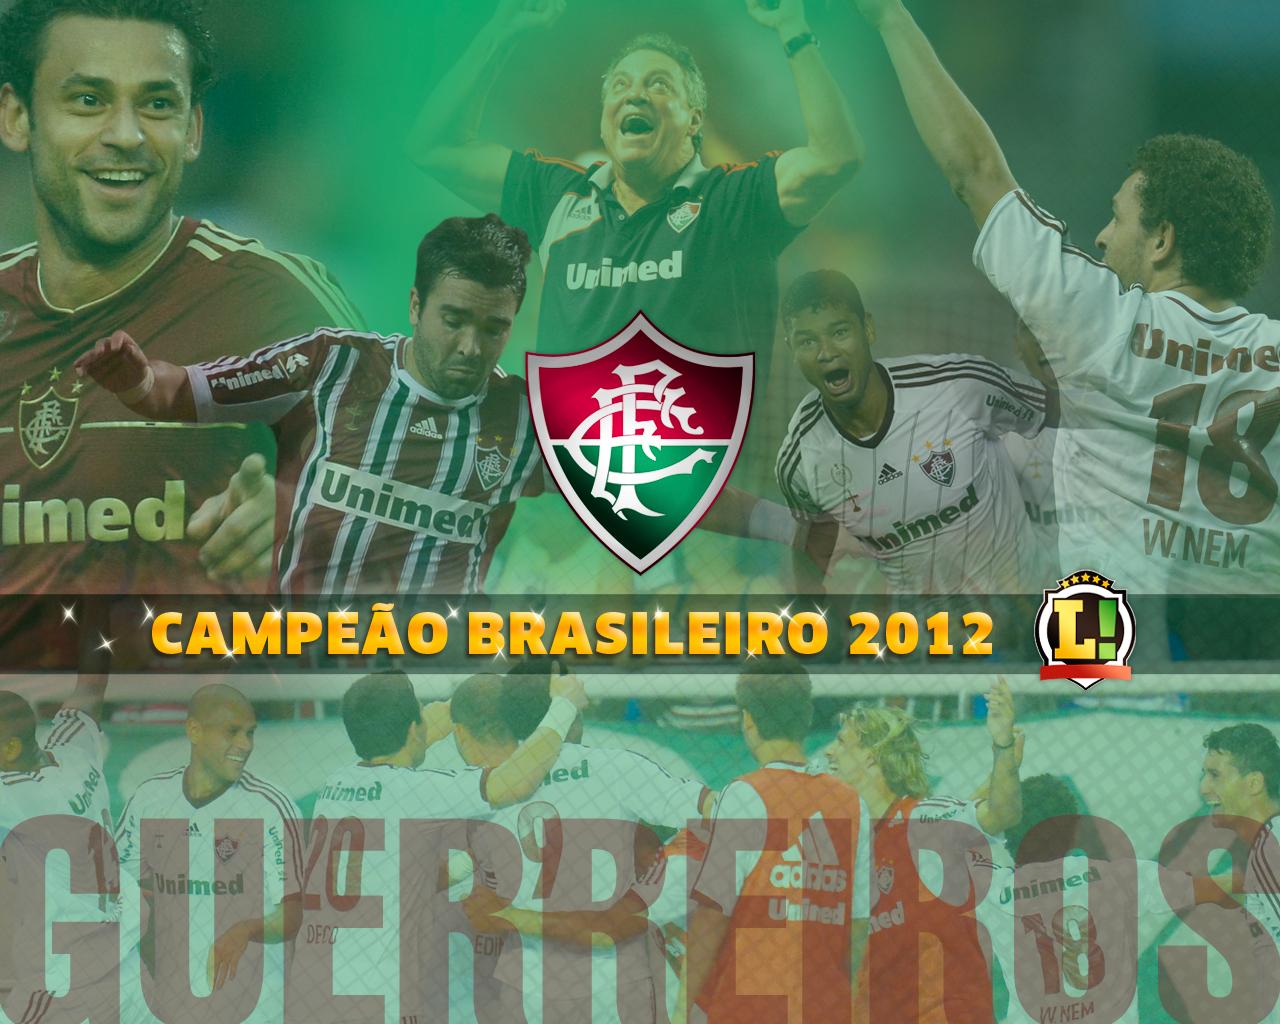 Wallpaper: Fluminense Campeão Brasileiro 2012 (4)